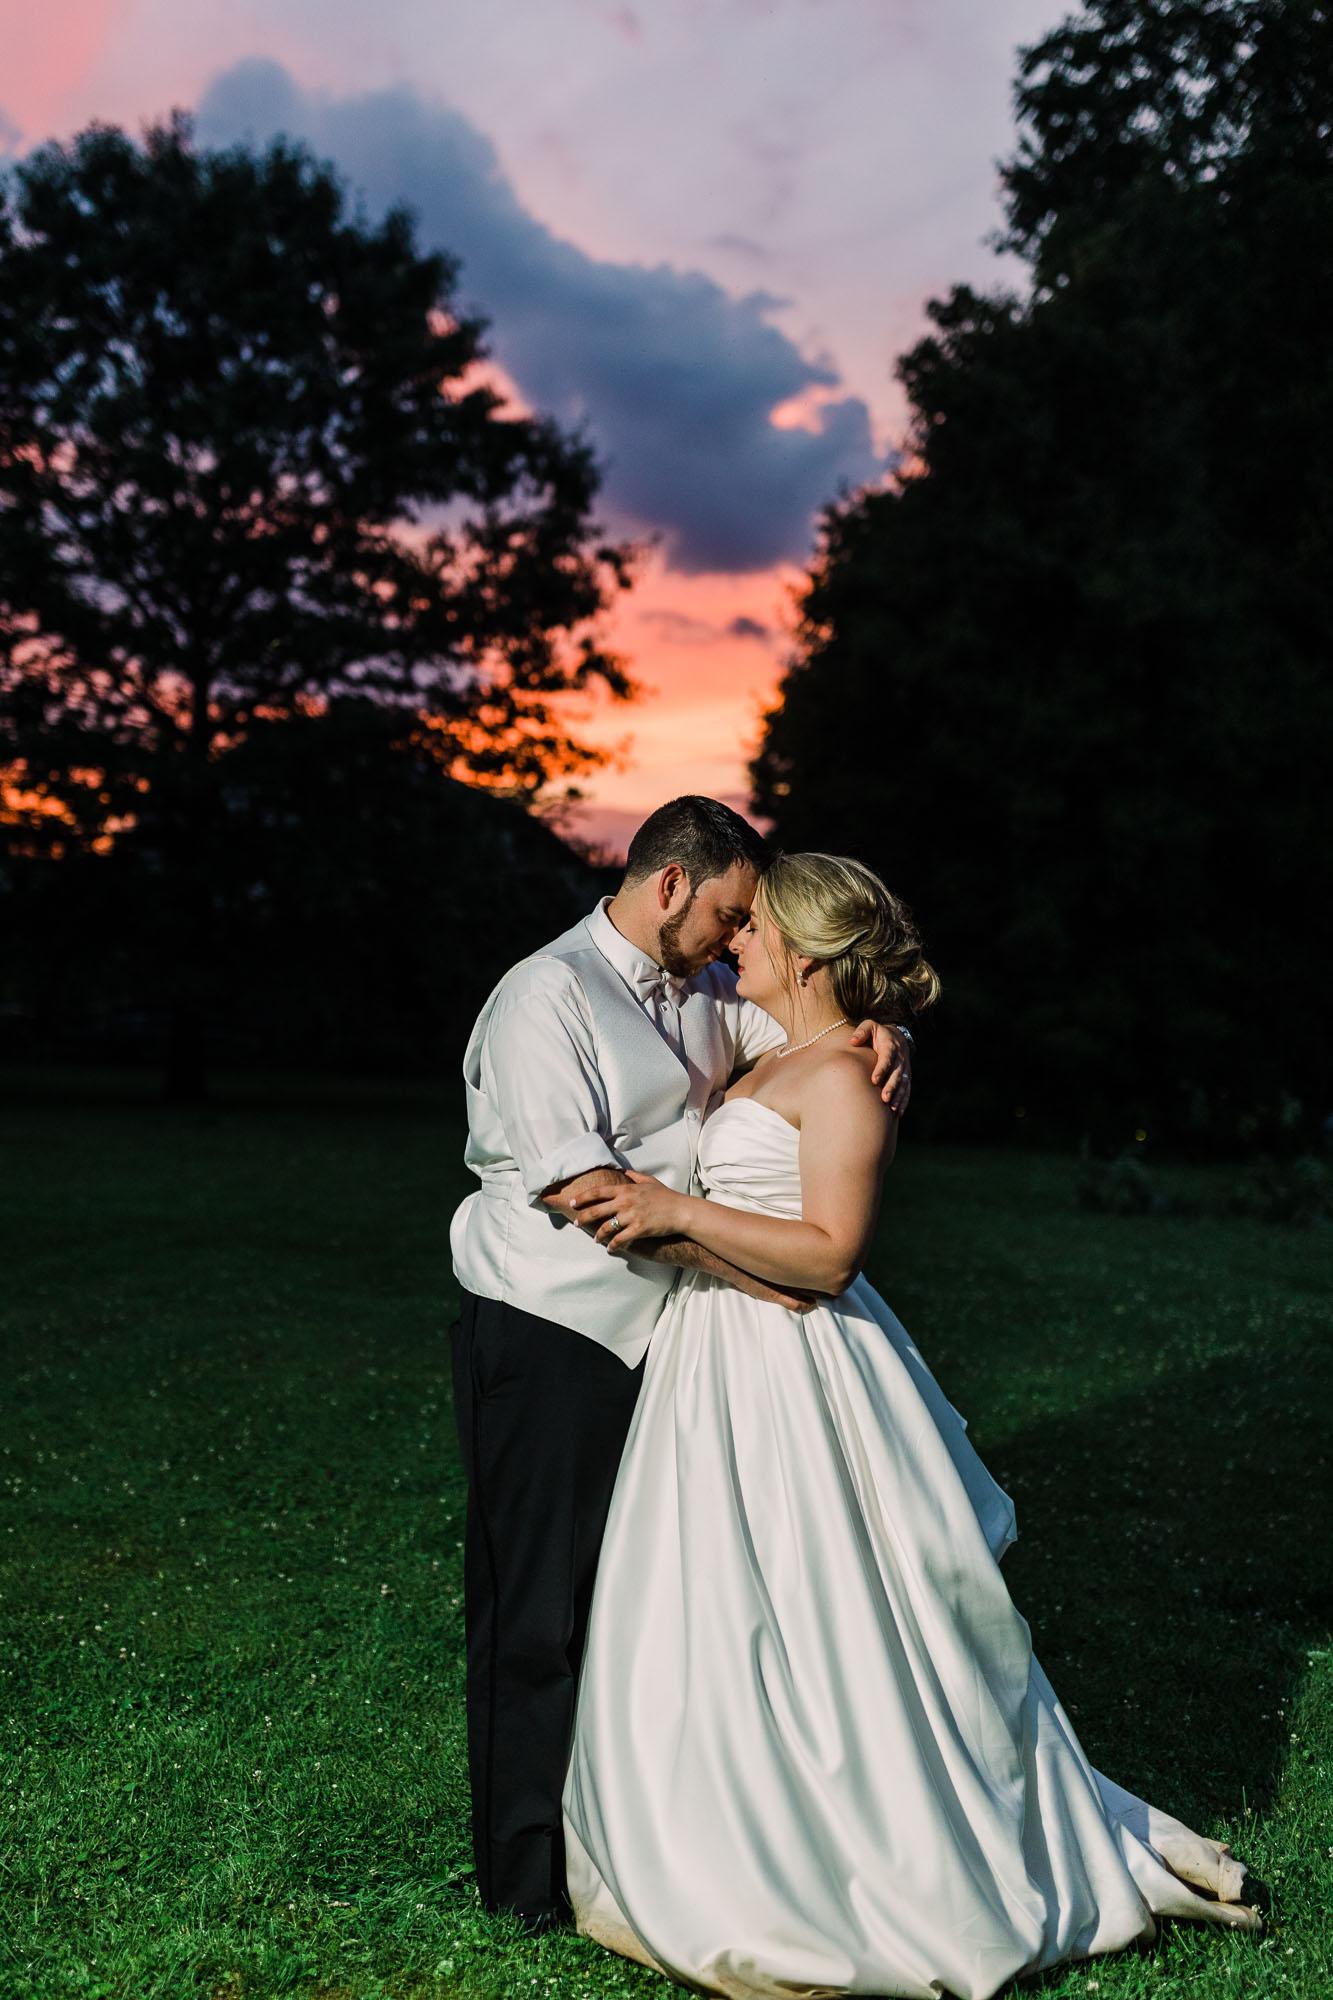 isle-of-que-wedding-7443.jpg